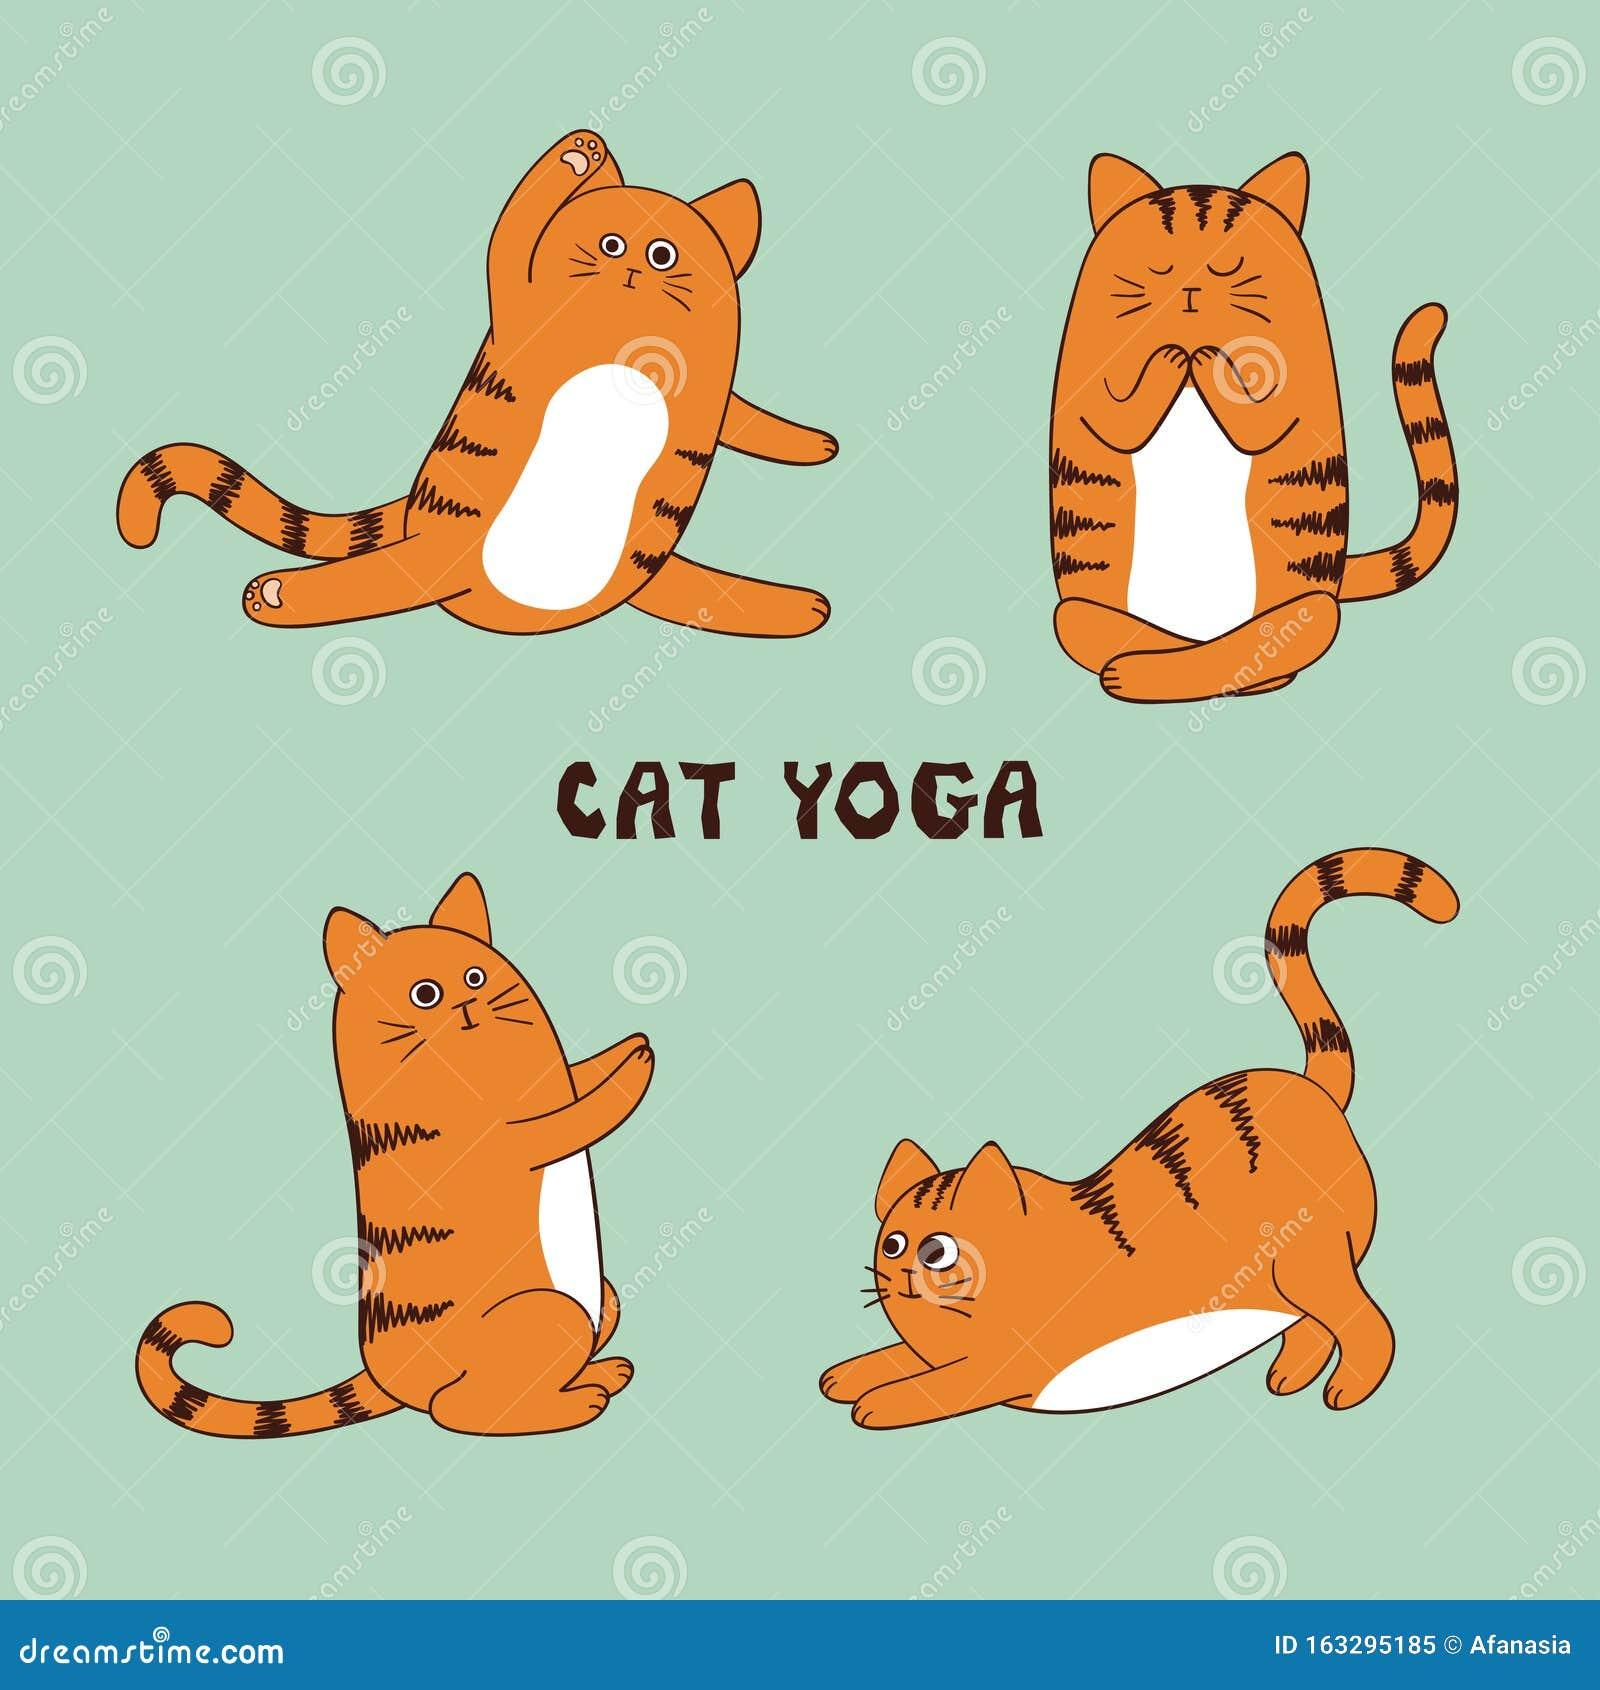 Cartoon Funny Yoga Cat Vector Illustration Animal Fitness Stock Vector Illustration Of Character Drawing 163295185